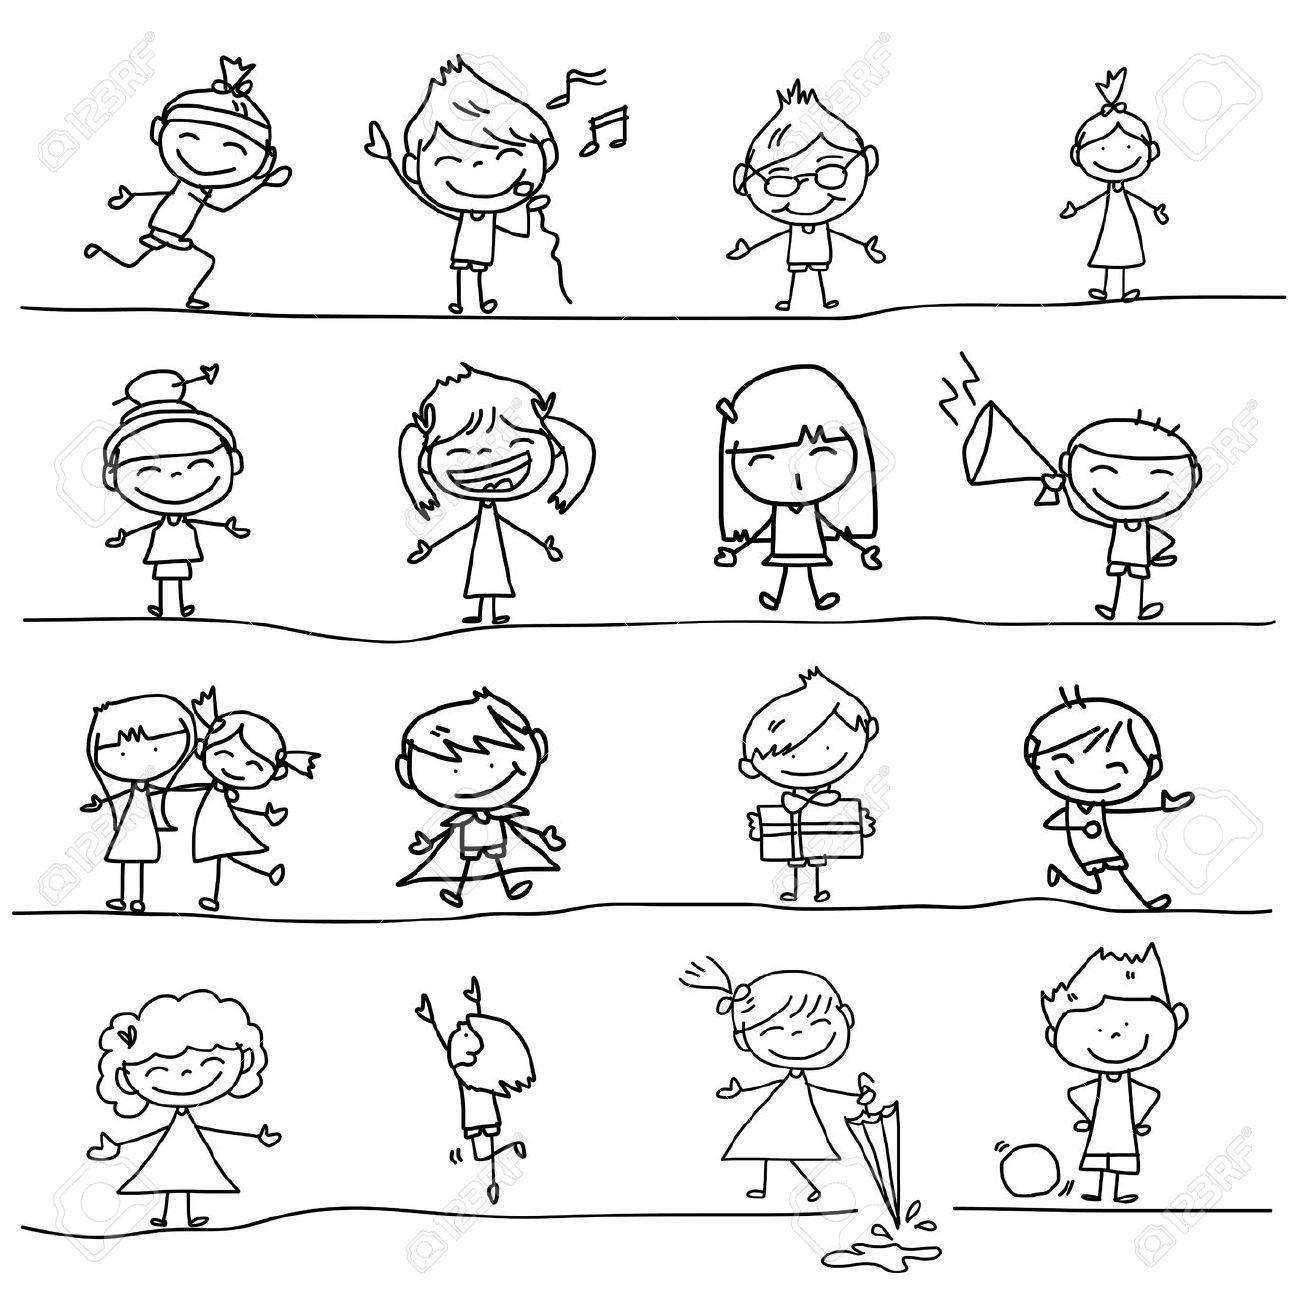 Vysledek Obrazku Pro Deti Kresba Kameny Pinterest Drawing For